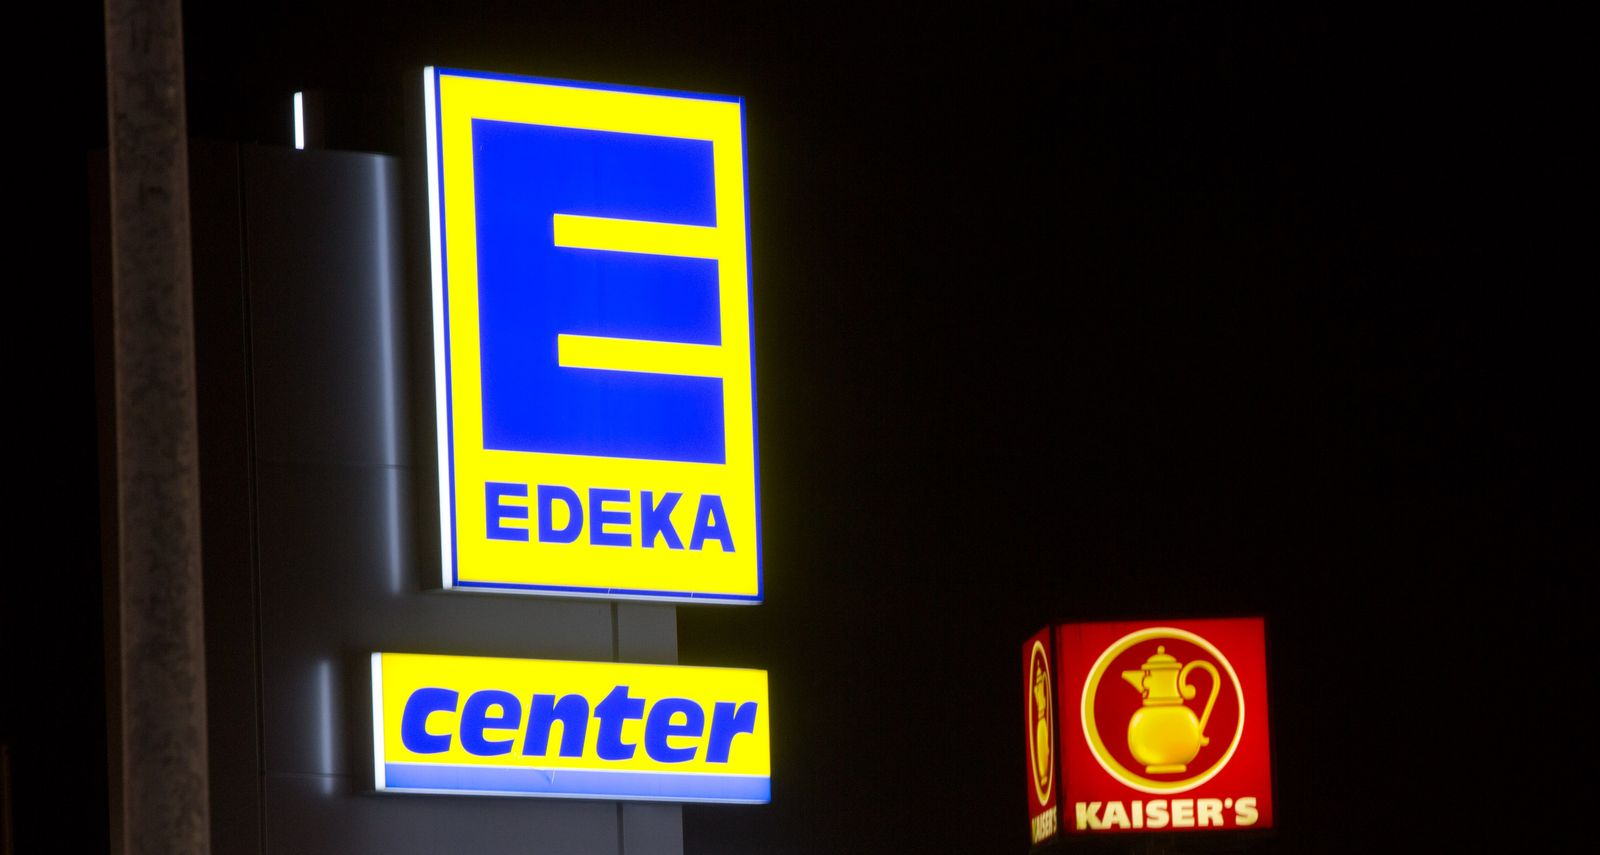 Kaisers Tengelmann - Edeka